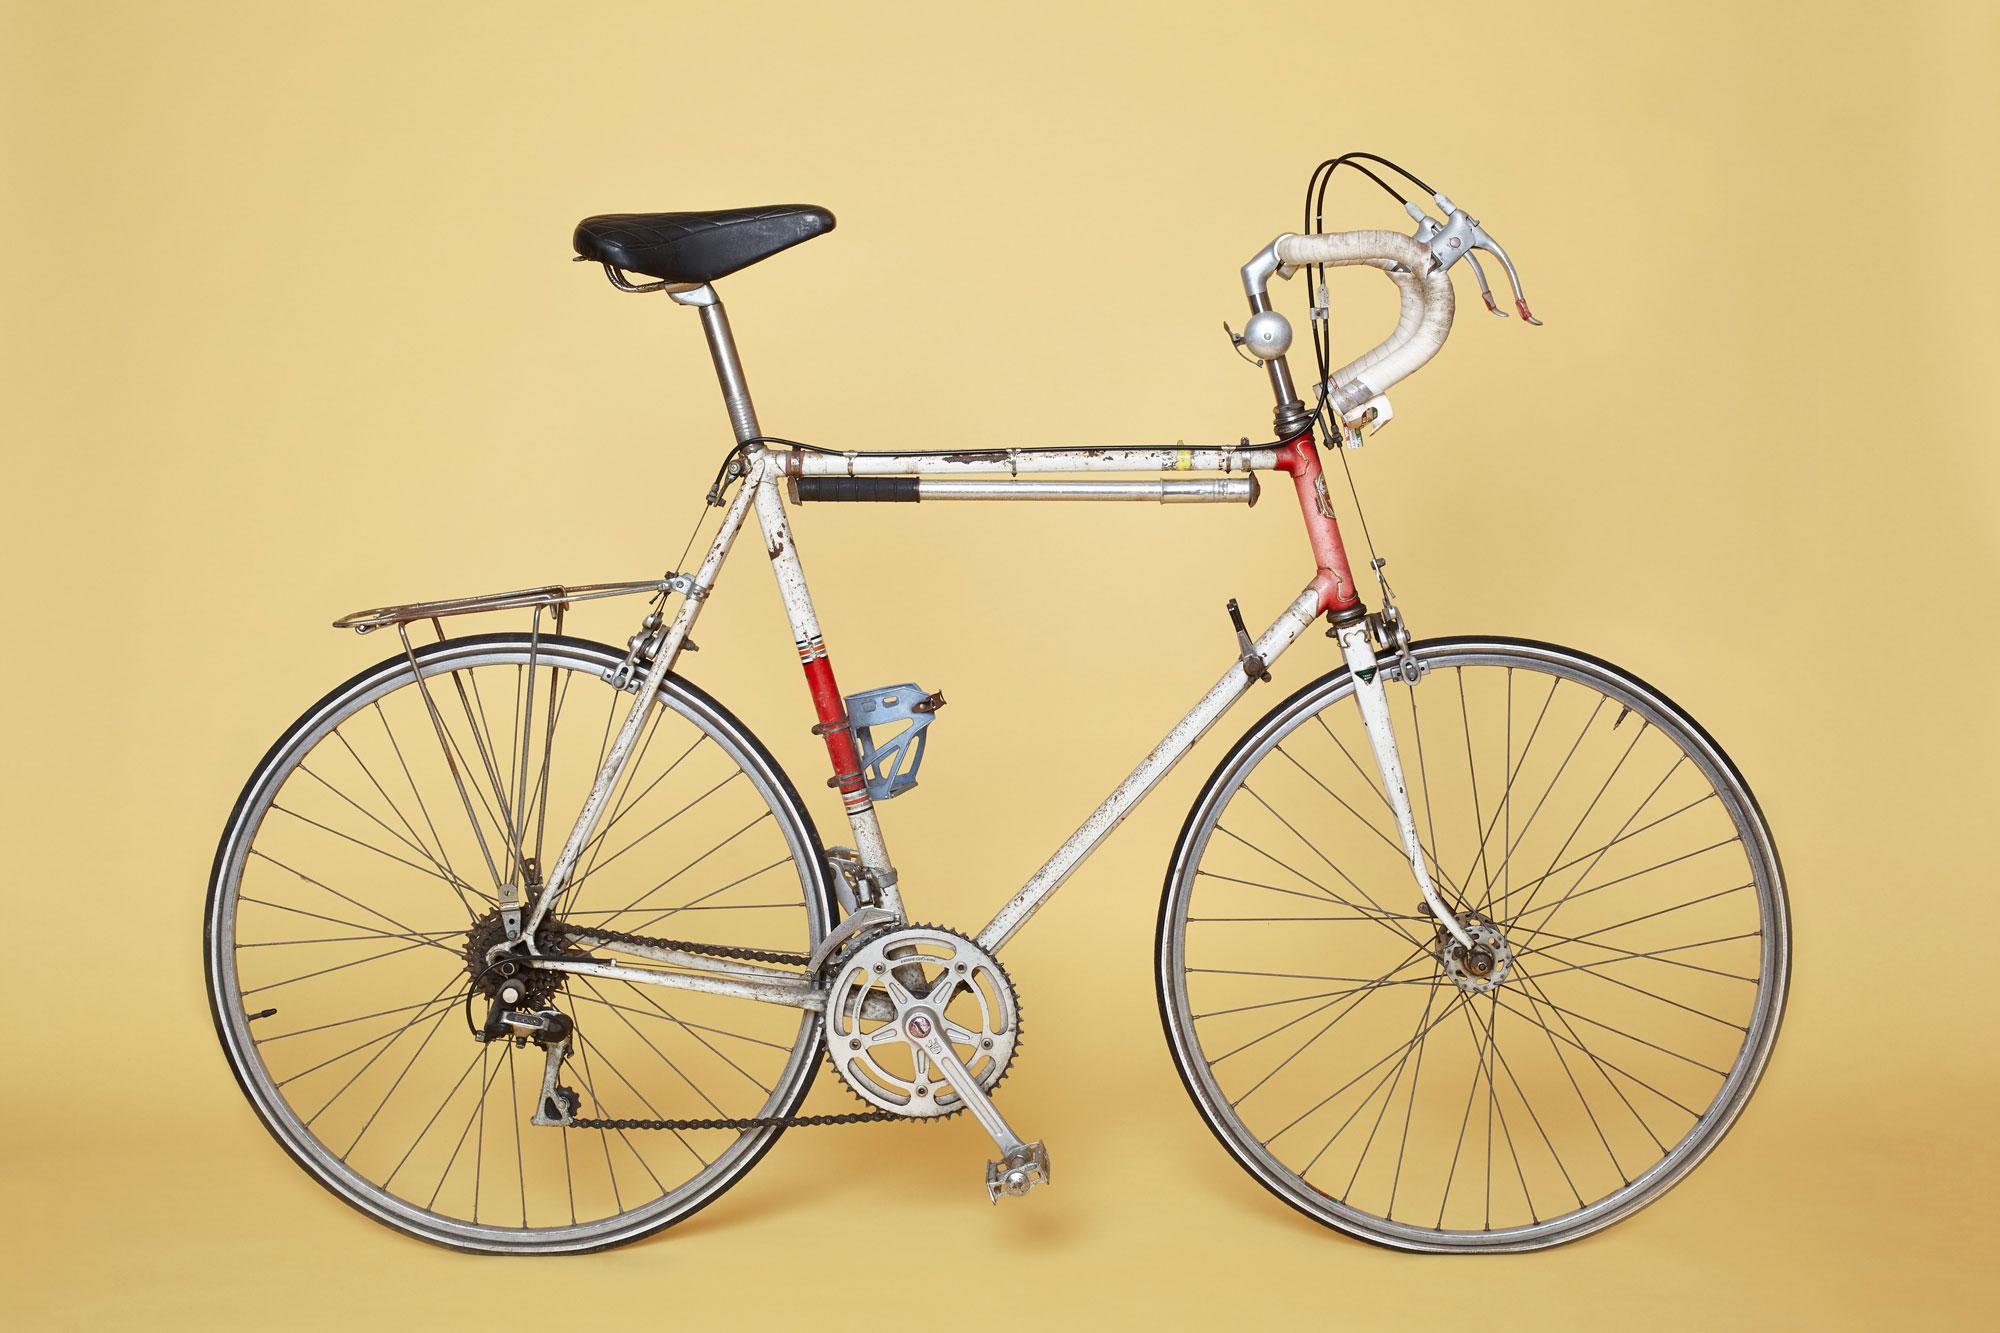 31_Bob_den-Uyl_fiets